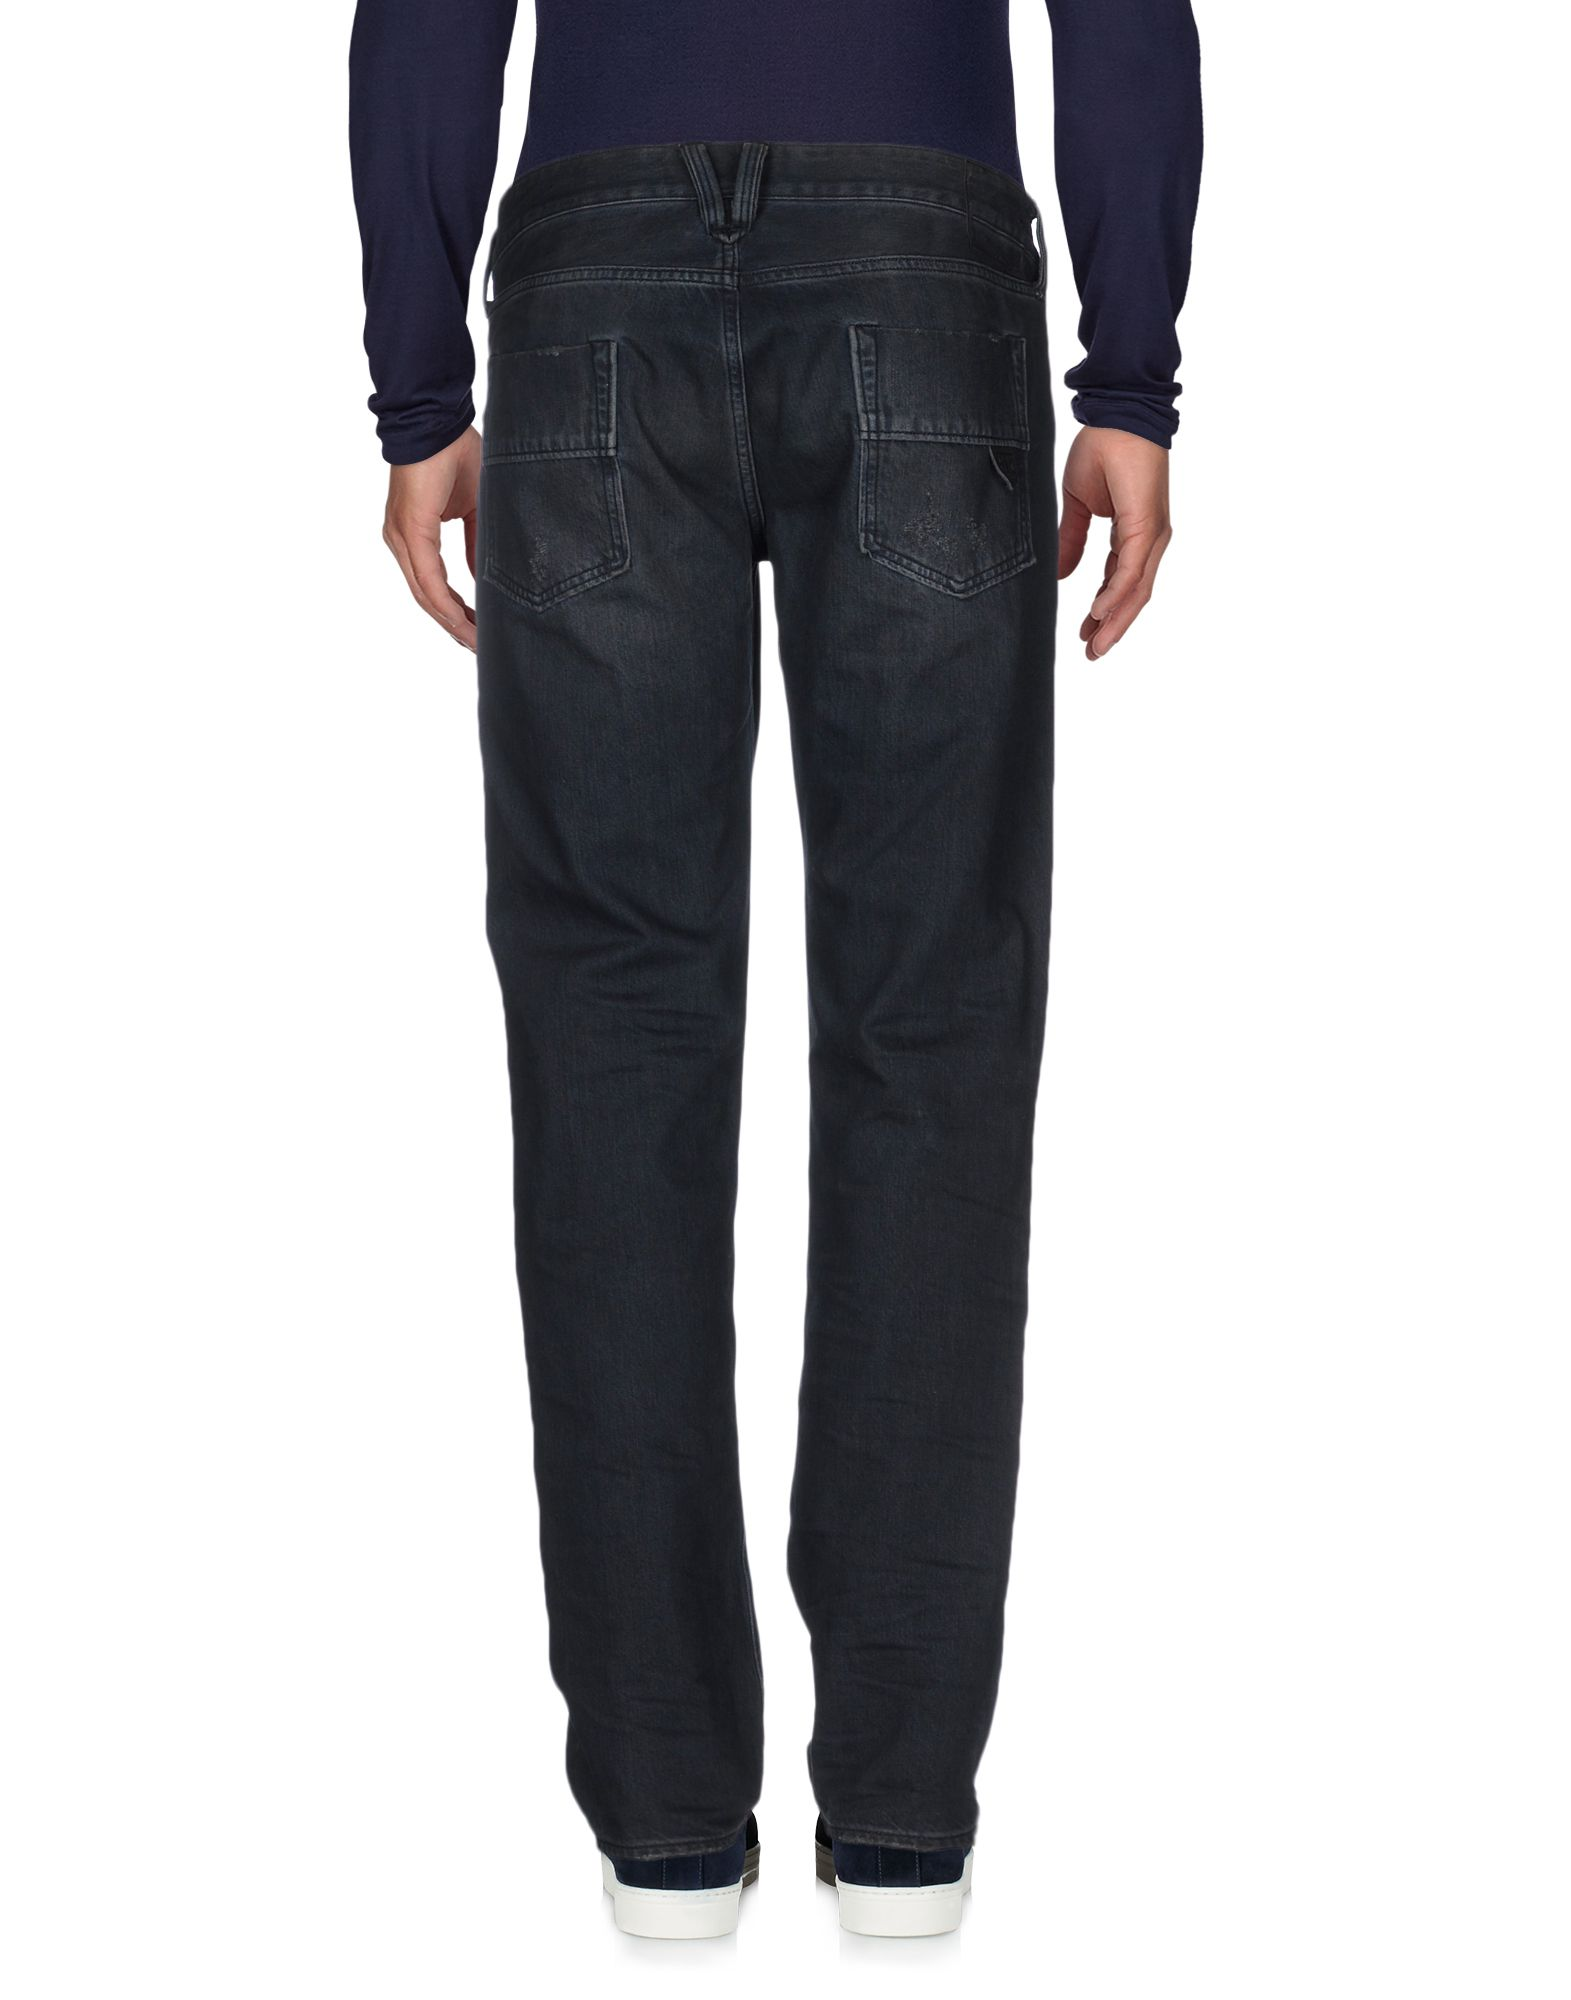 Pantaloni Jeans Htc Htc Htc Uomo - 42509119VT 4e36d5